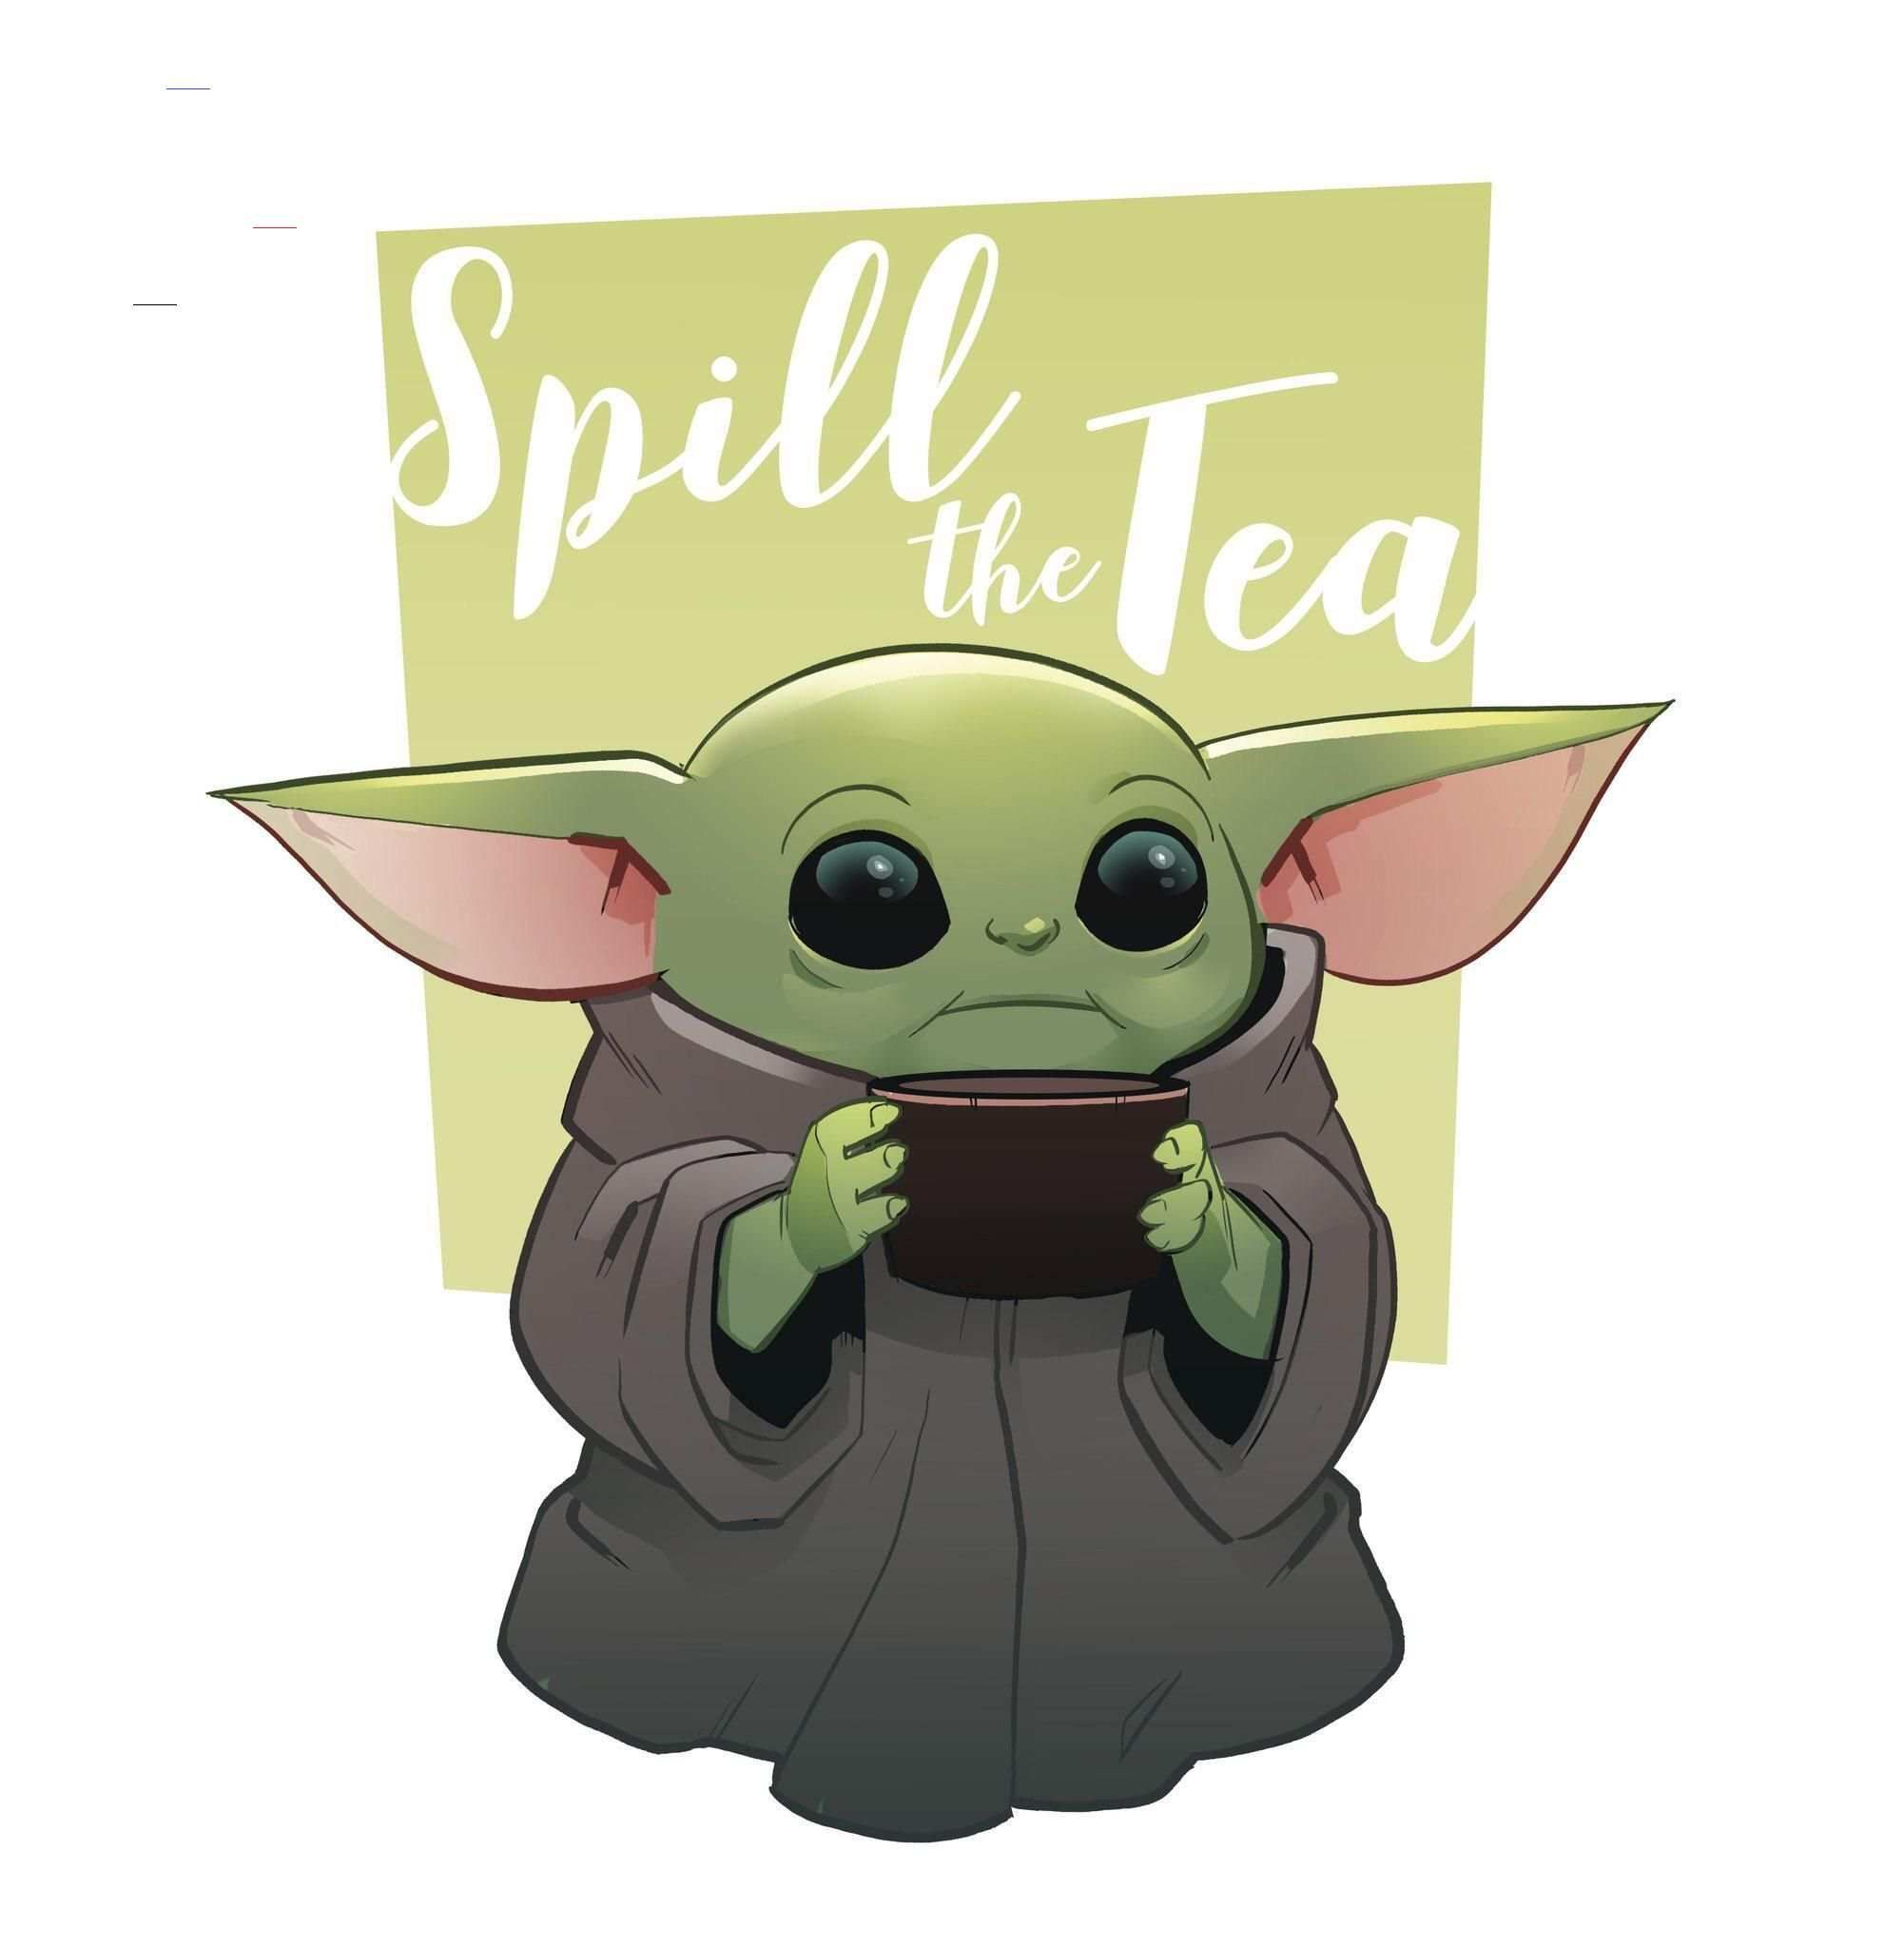 Love the new meme /r/Yiddle Baby Yoda